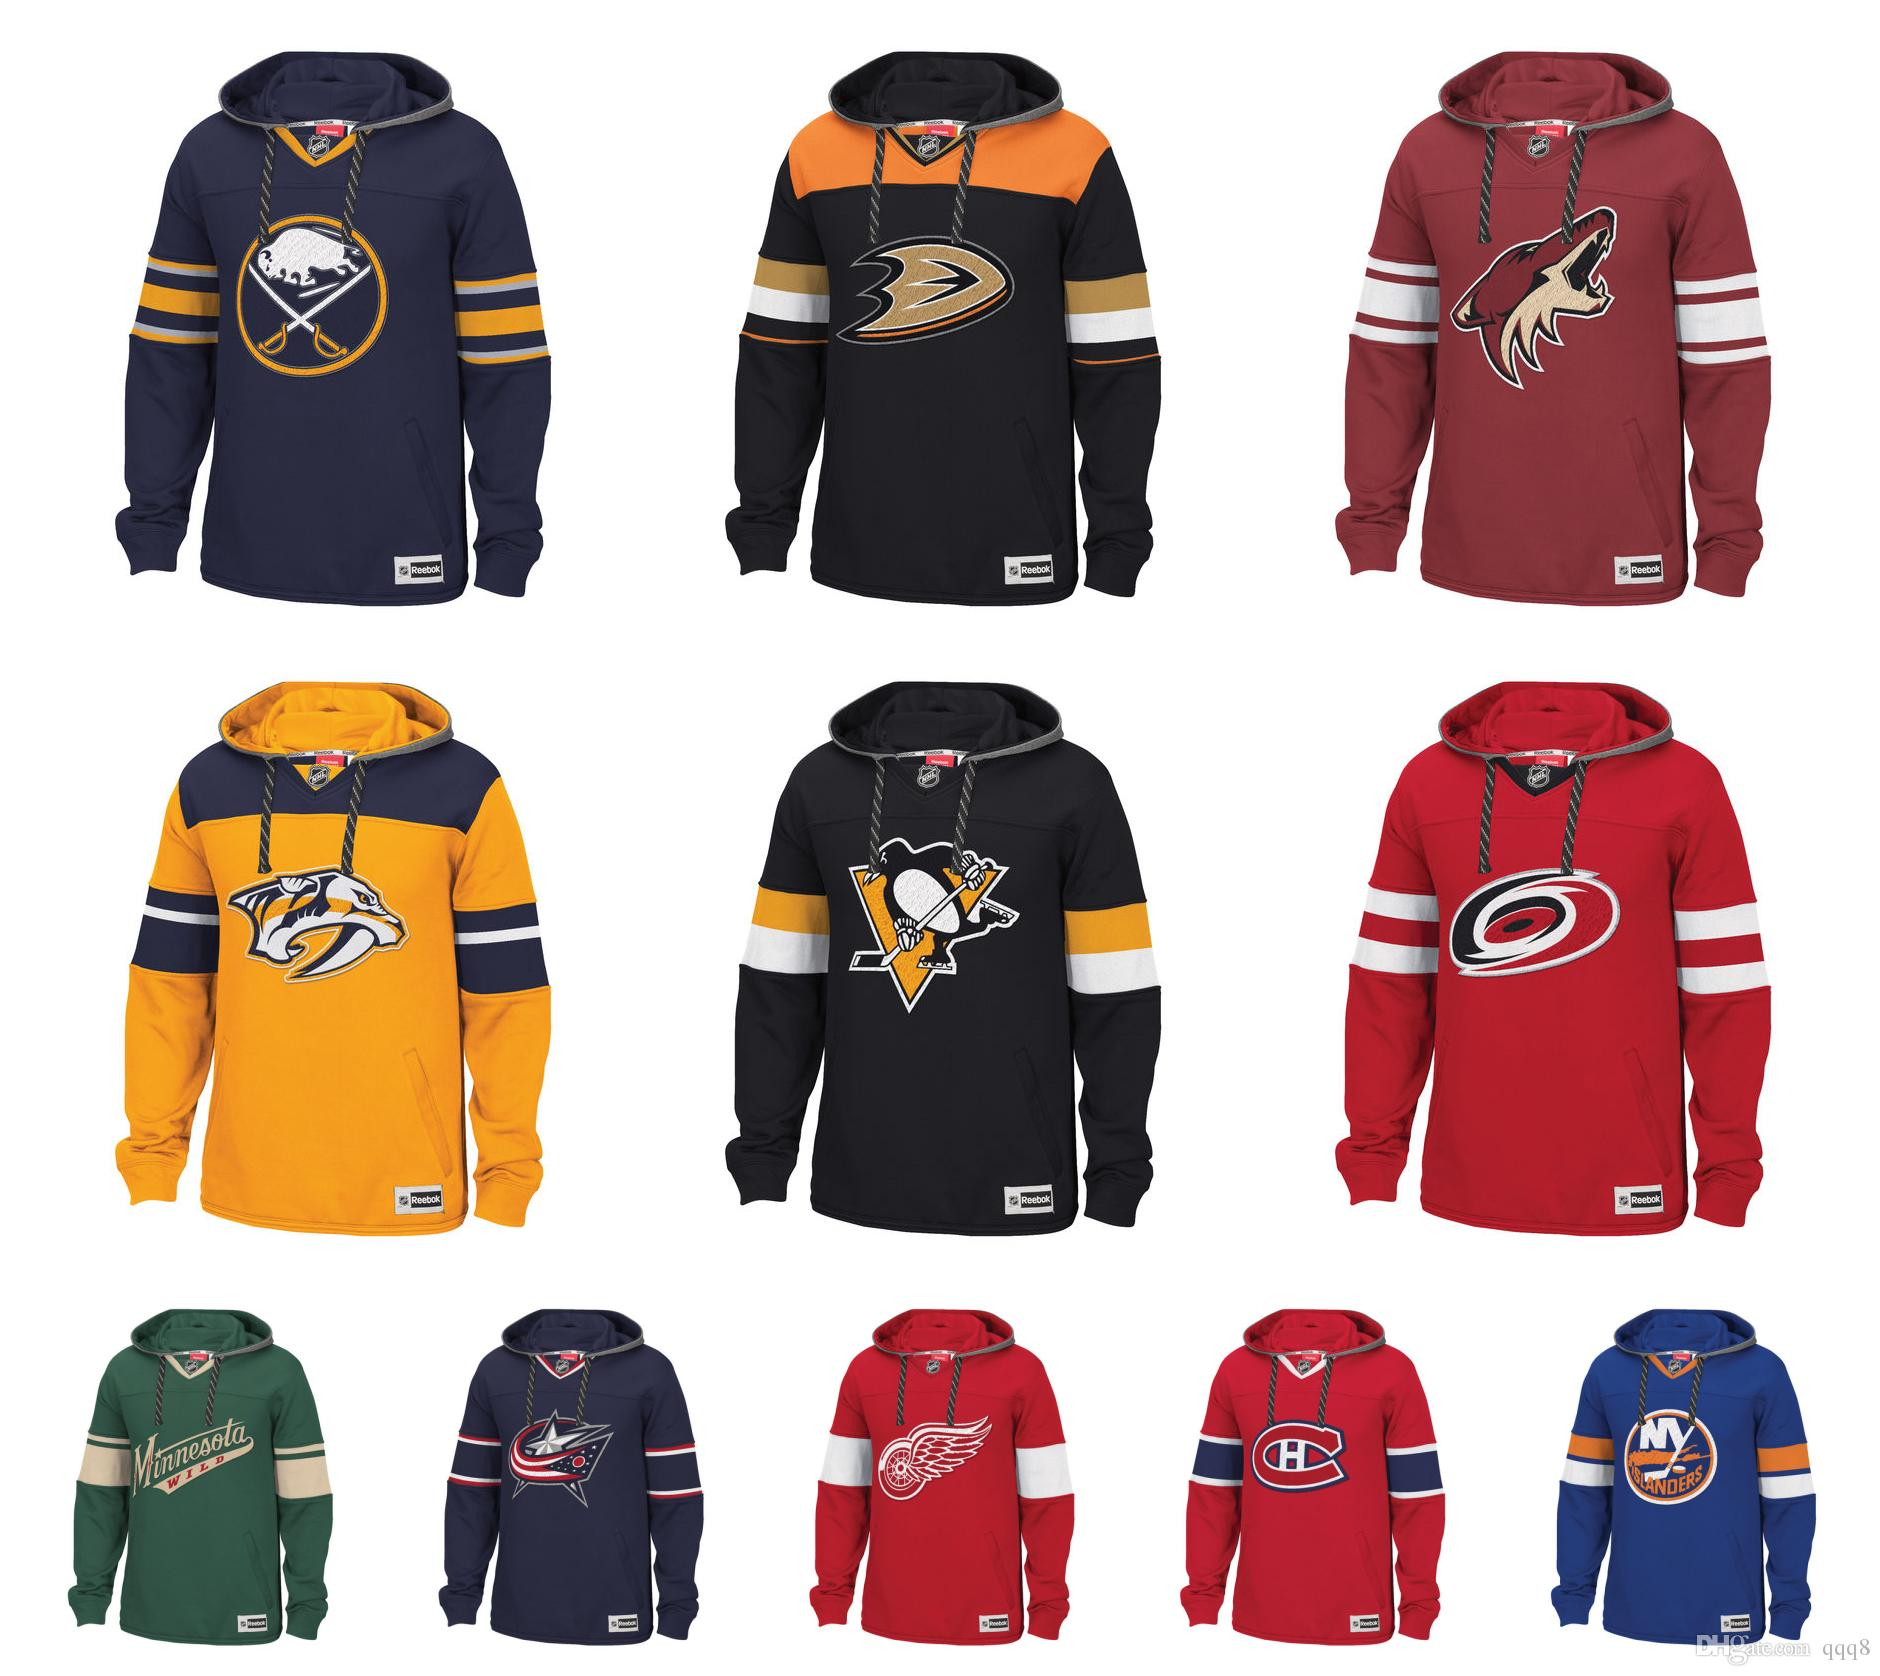 a1bb9714 Sudadera con capucha de hockey NHL personalizada Predators de Nashville  Detroit Red Wings Montreal Canadiens San Jose Sharks Pingüinos de  Pittsburgh ...